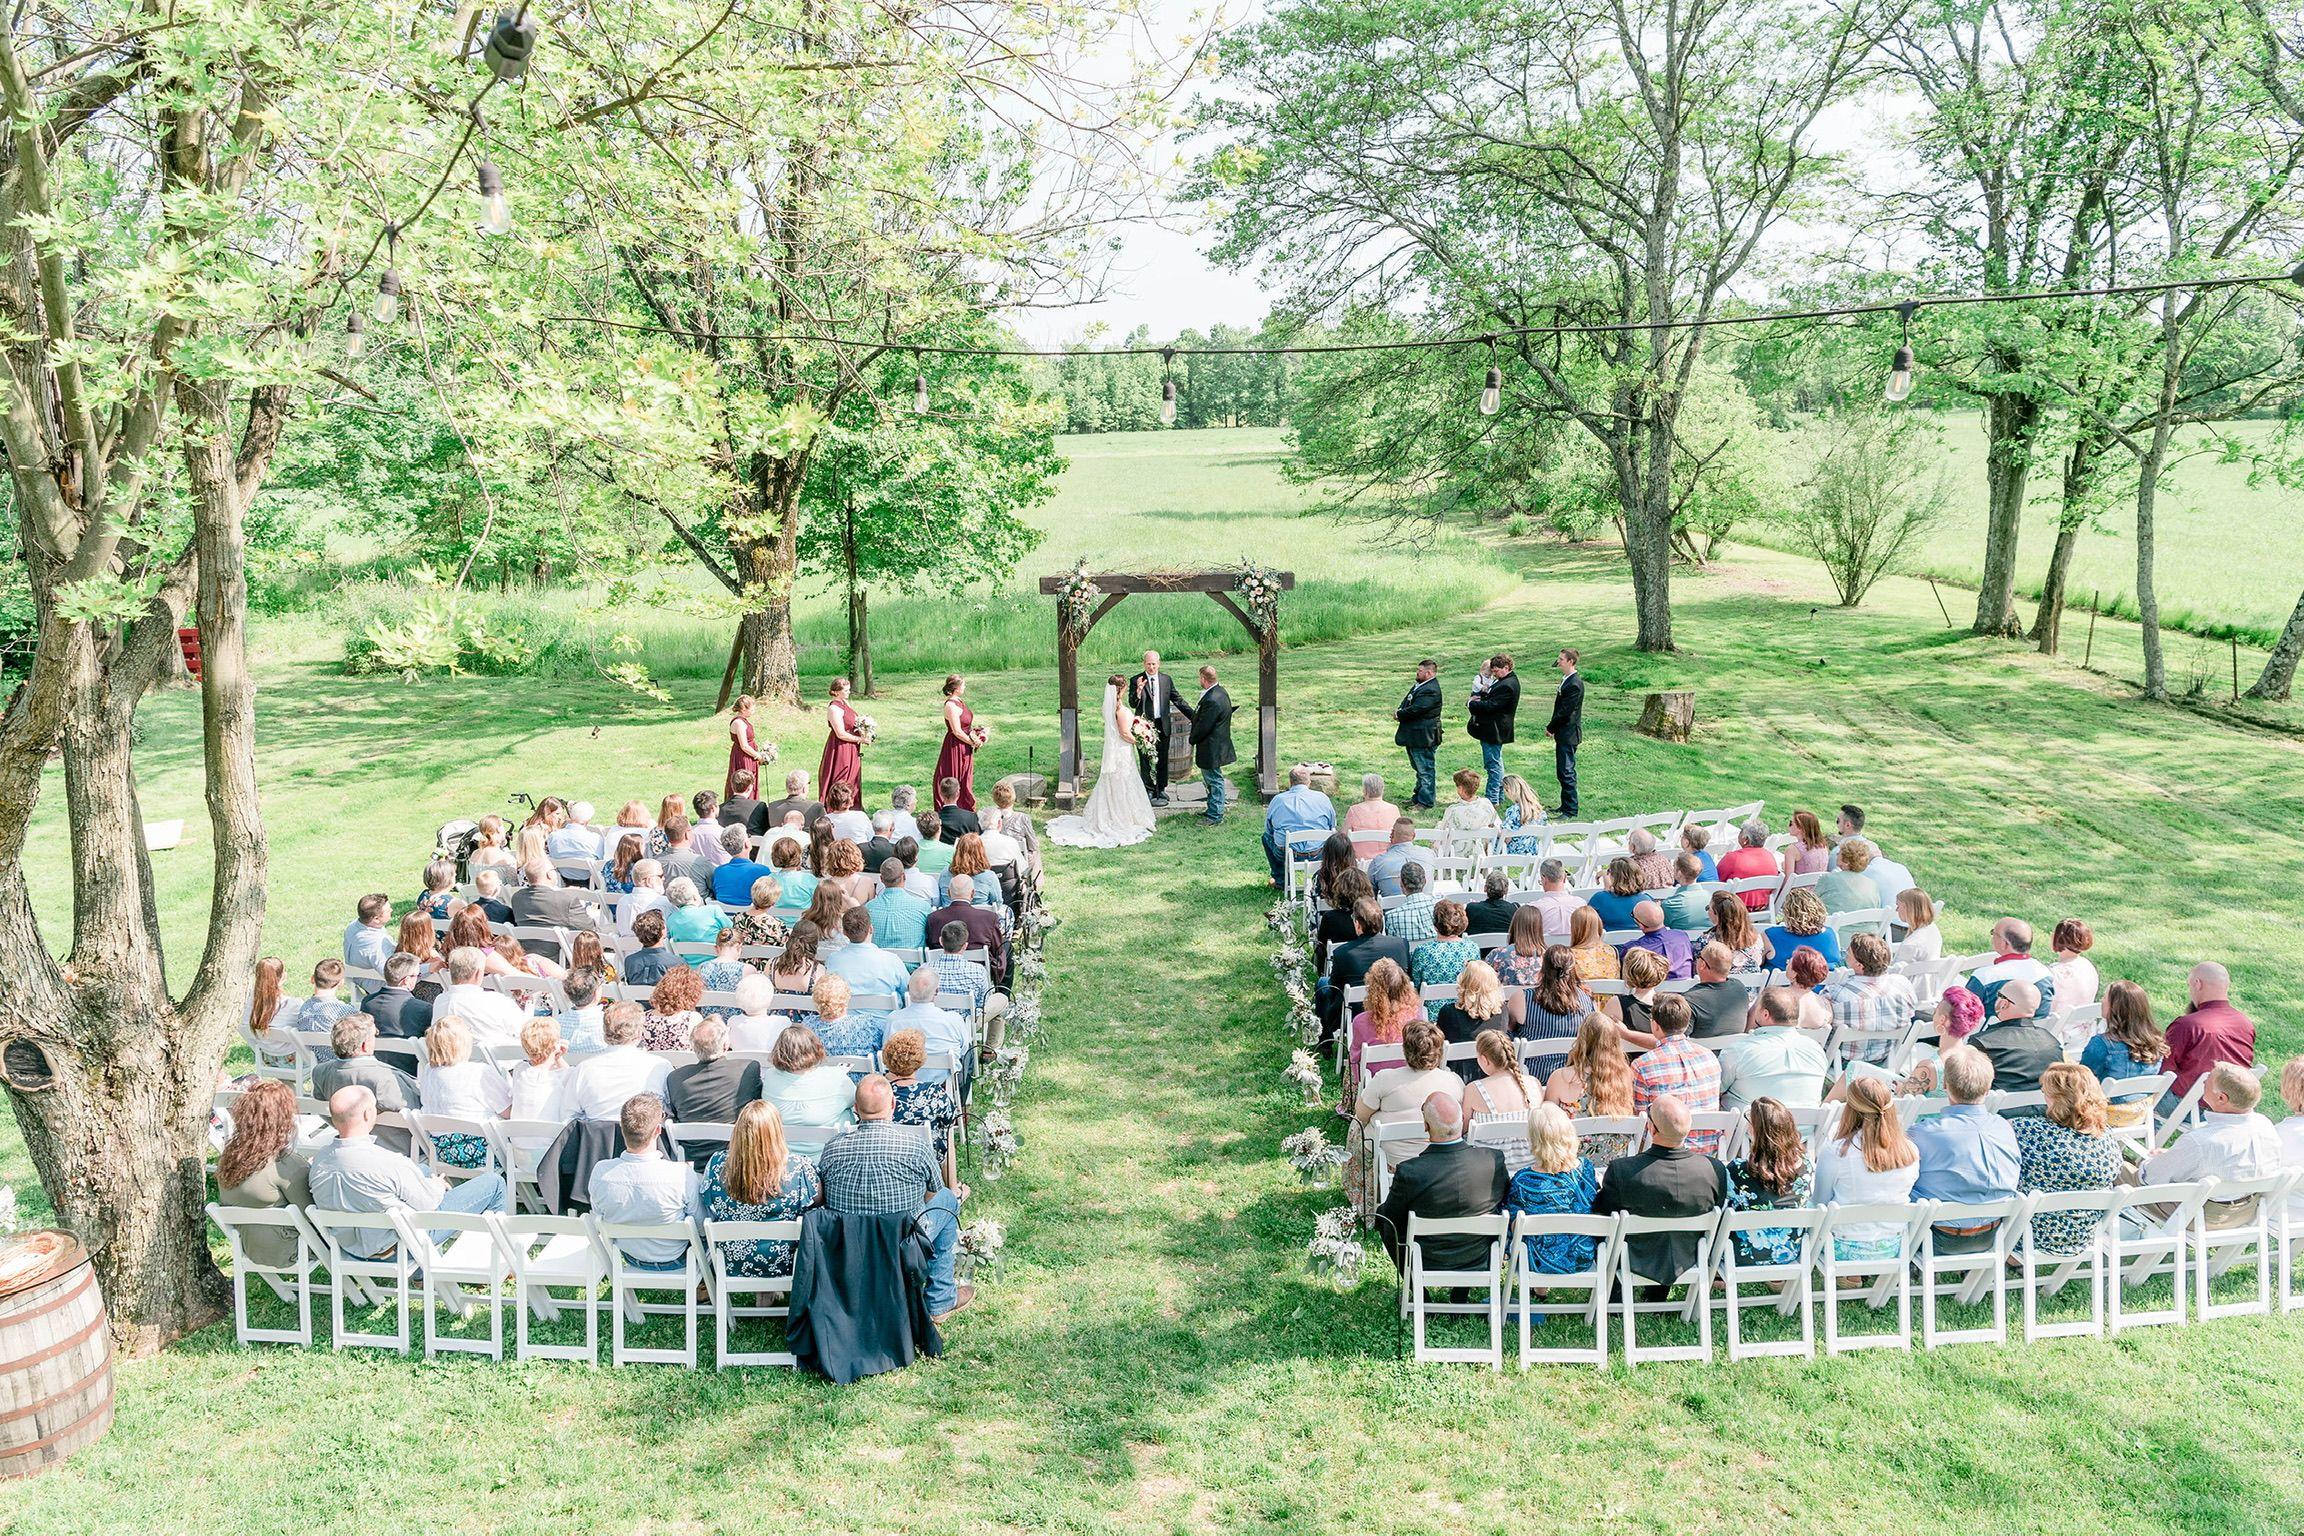 Rustic Chic Country Barn Wedding Venue Outdoor Summer